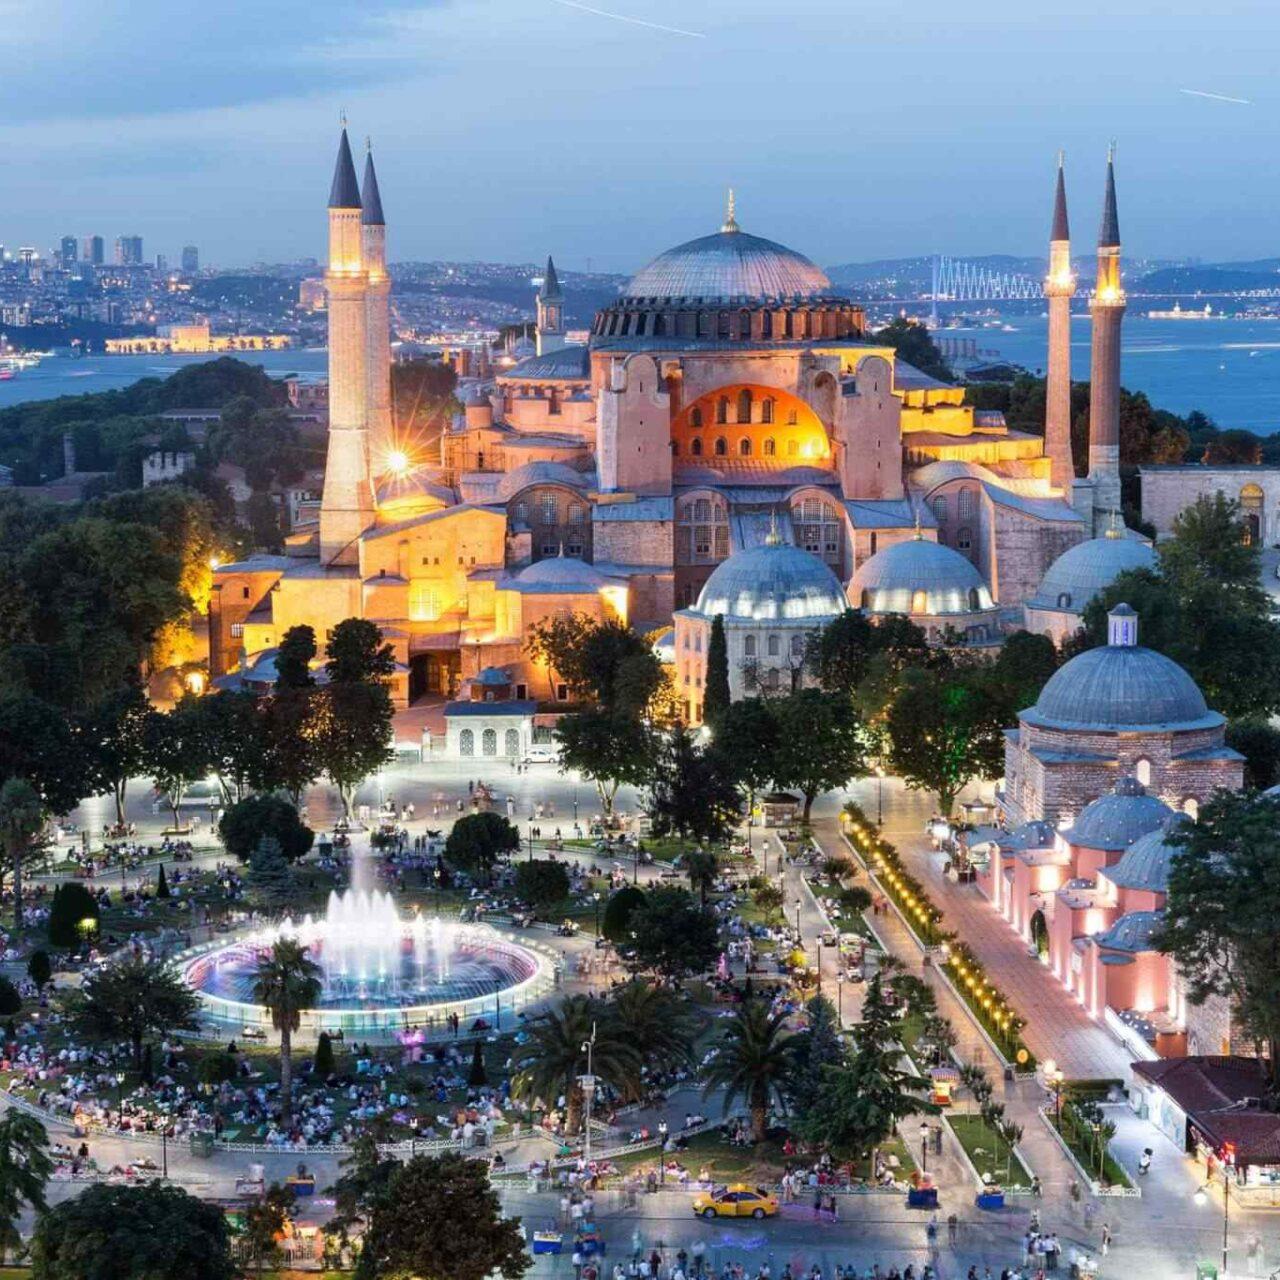 https://www.egyptravel4you.com/wp-content/uploads/2018/09/destination-istanbul-02-1280x1280.jpg